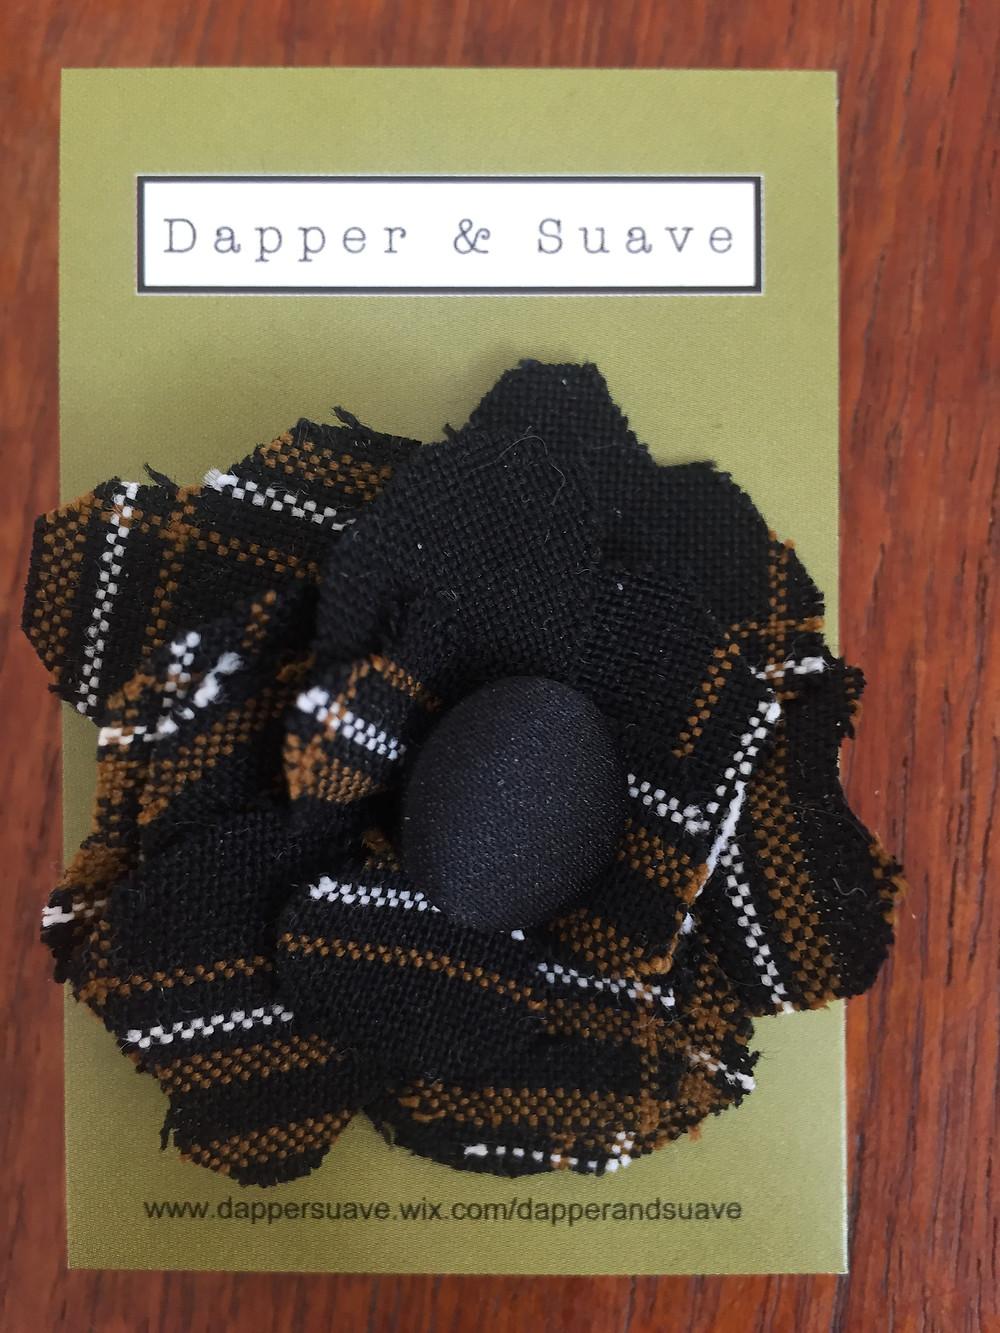 Dapper & Suave Black Tweed Button Lapel Pin